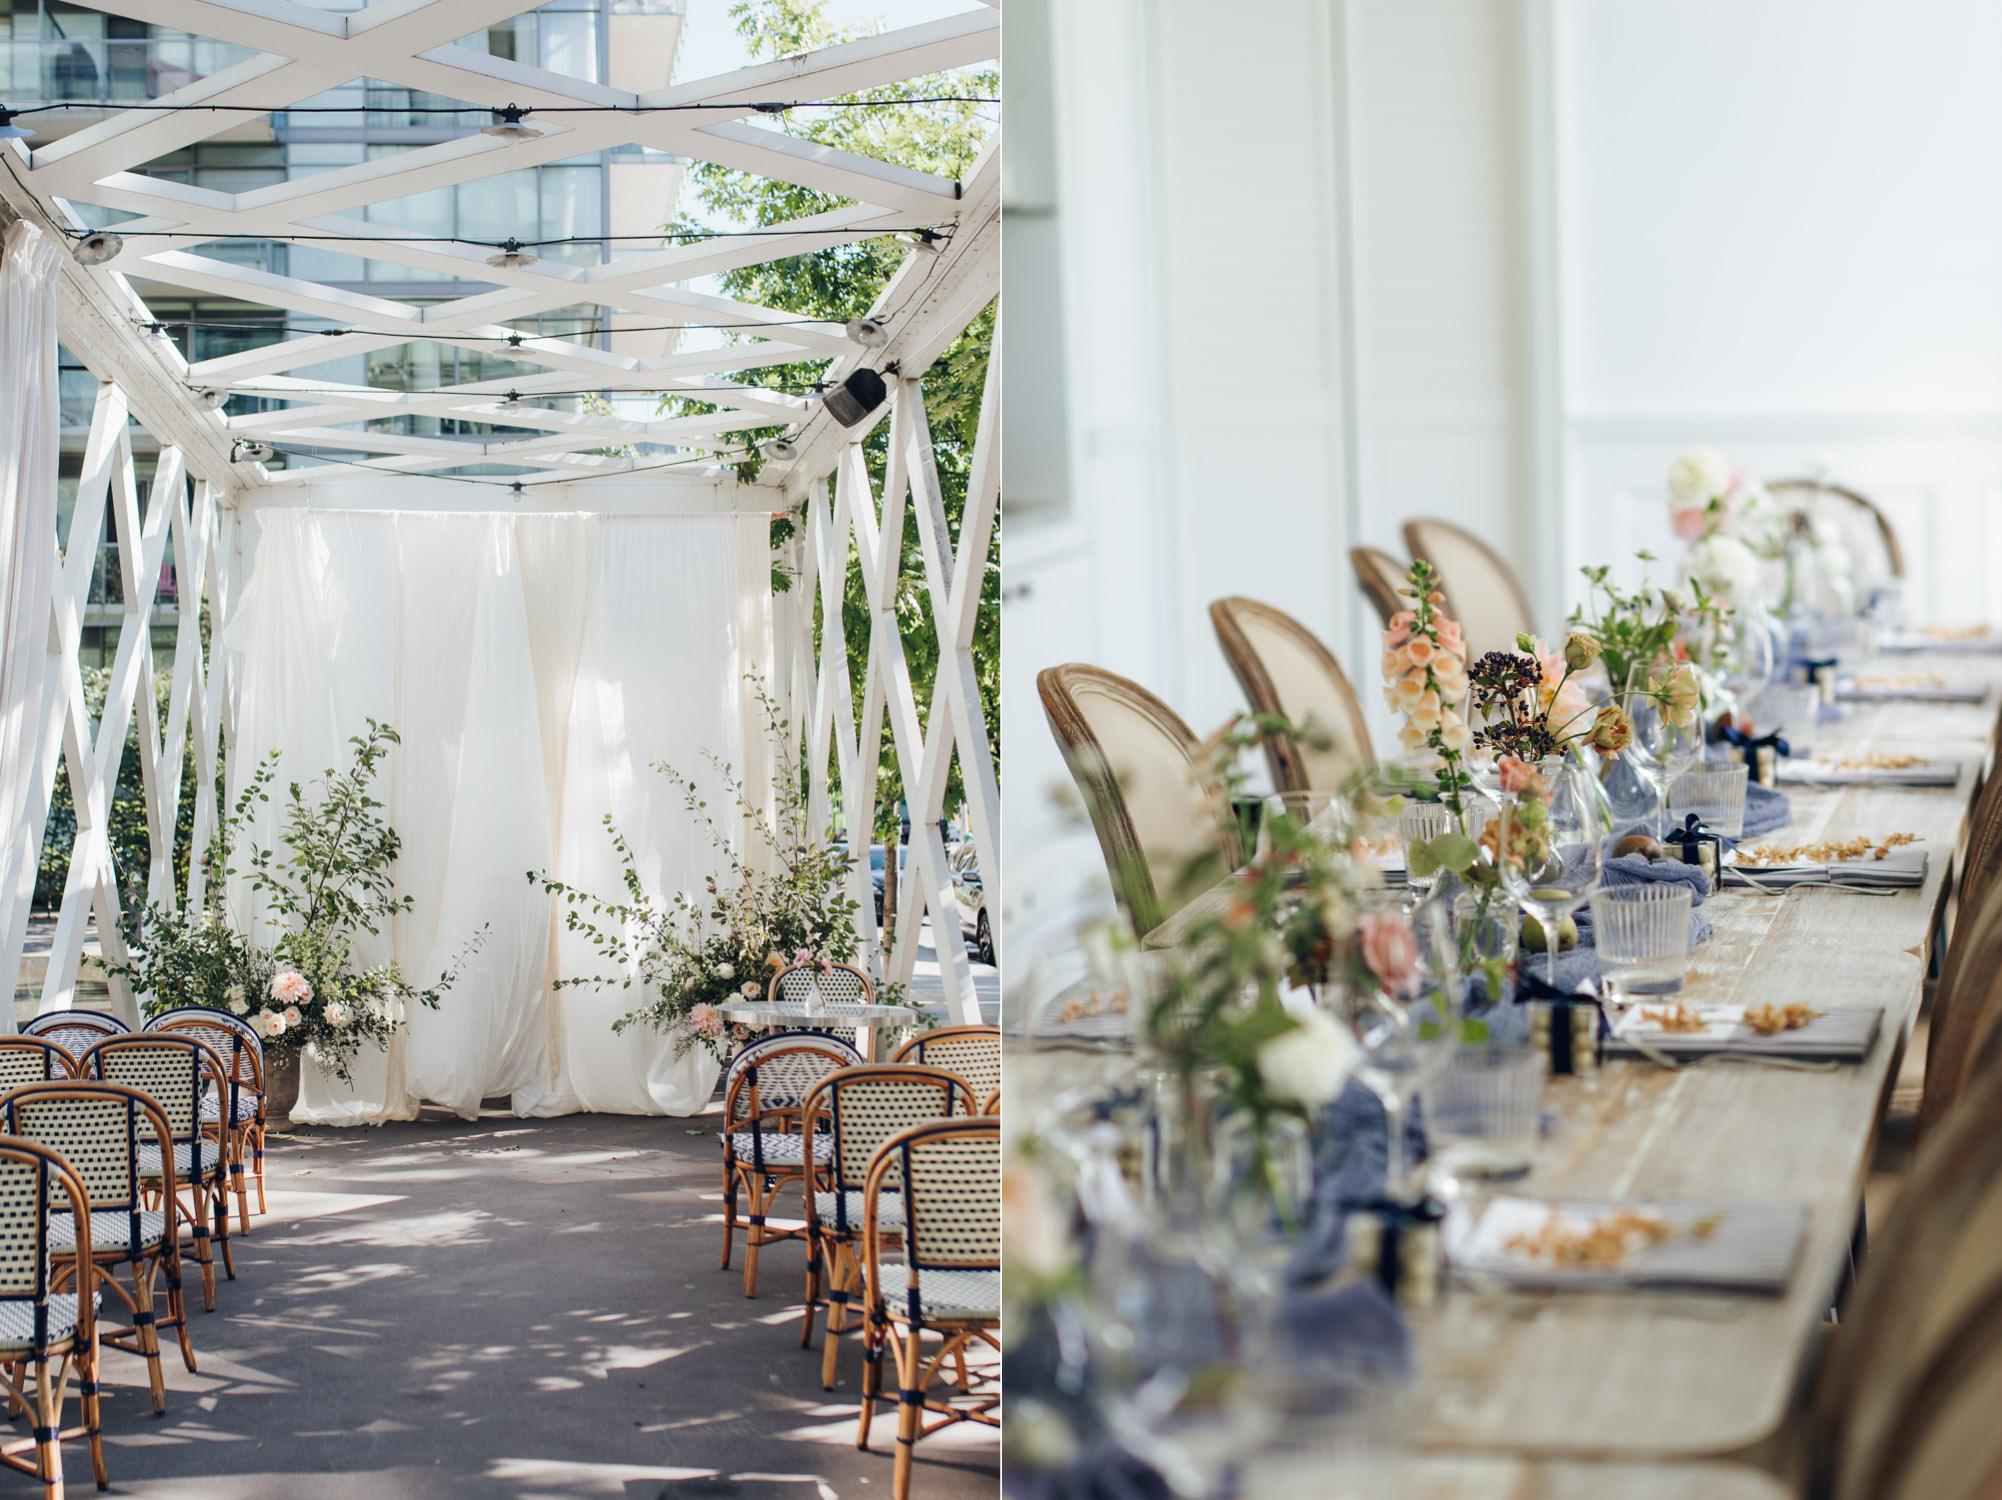 Toronto Colette grand cafe Wedding Ceremony Details